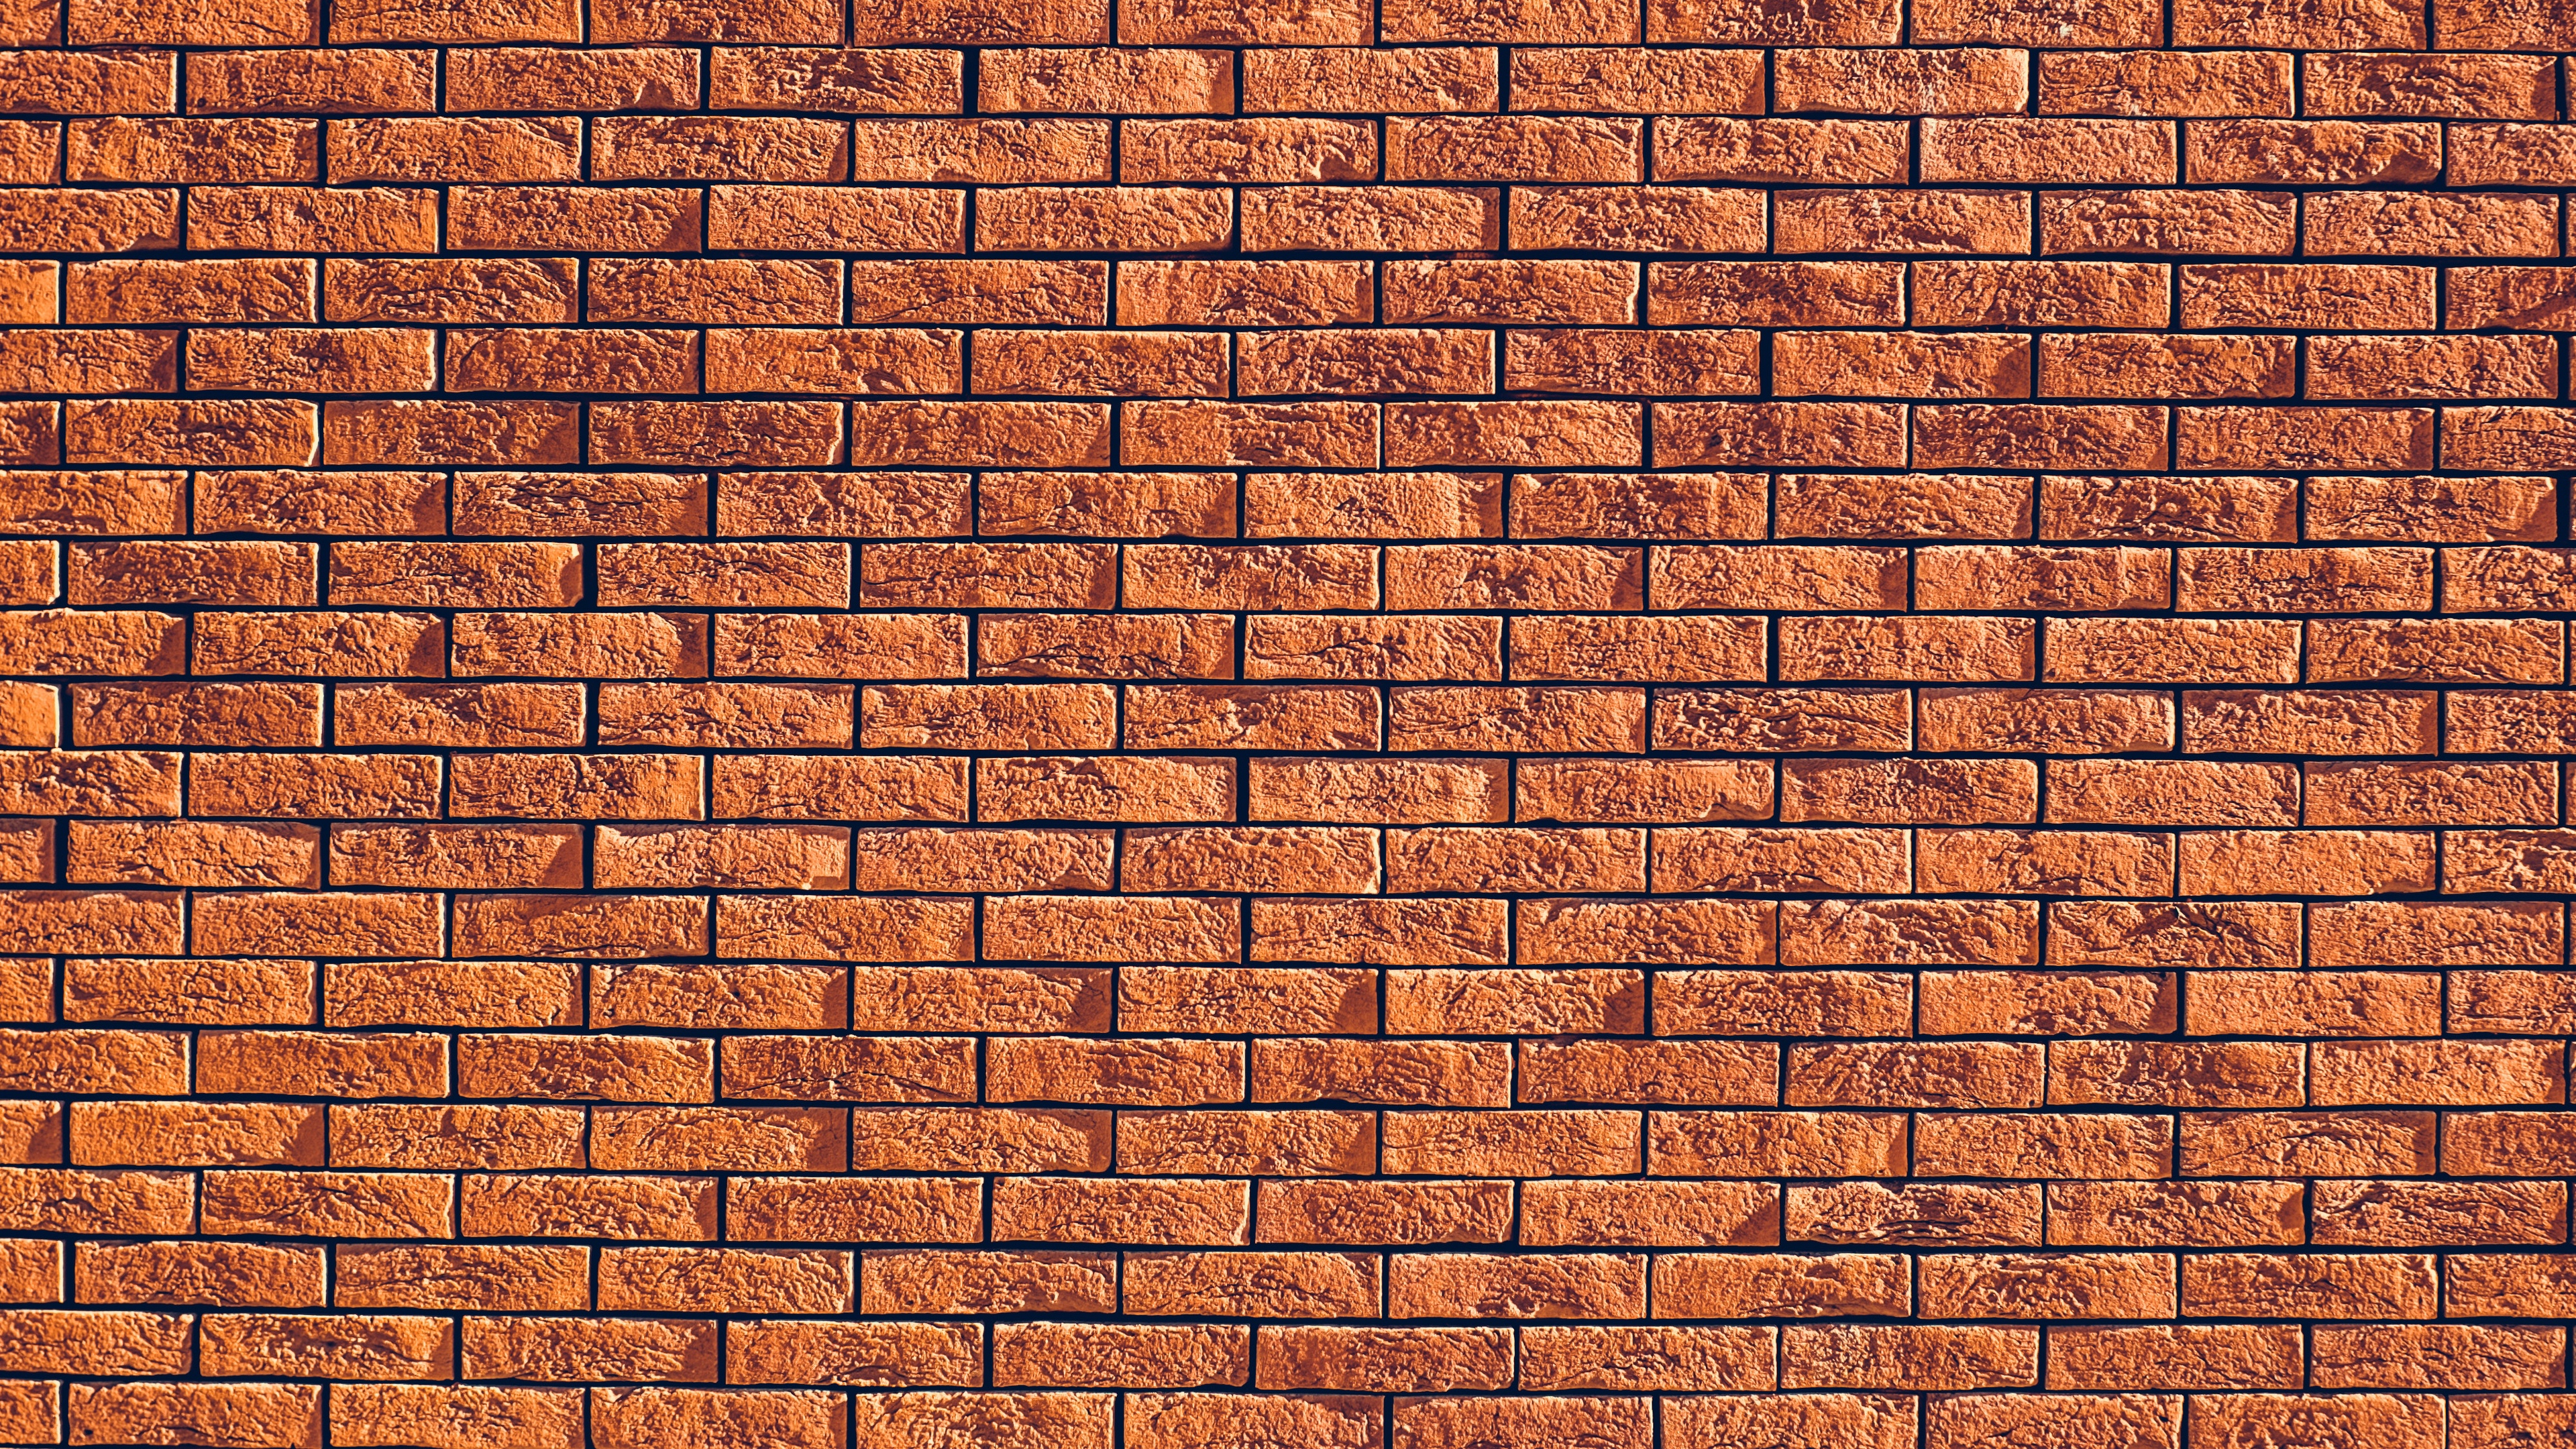 Wallpaper Wall, Texture, Bricks, Light - Brick Wall Texture 4k - HD Wallpaper